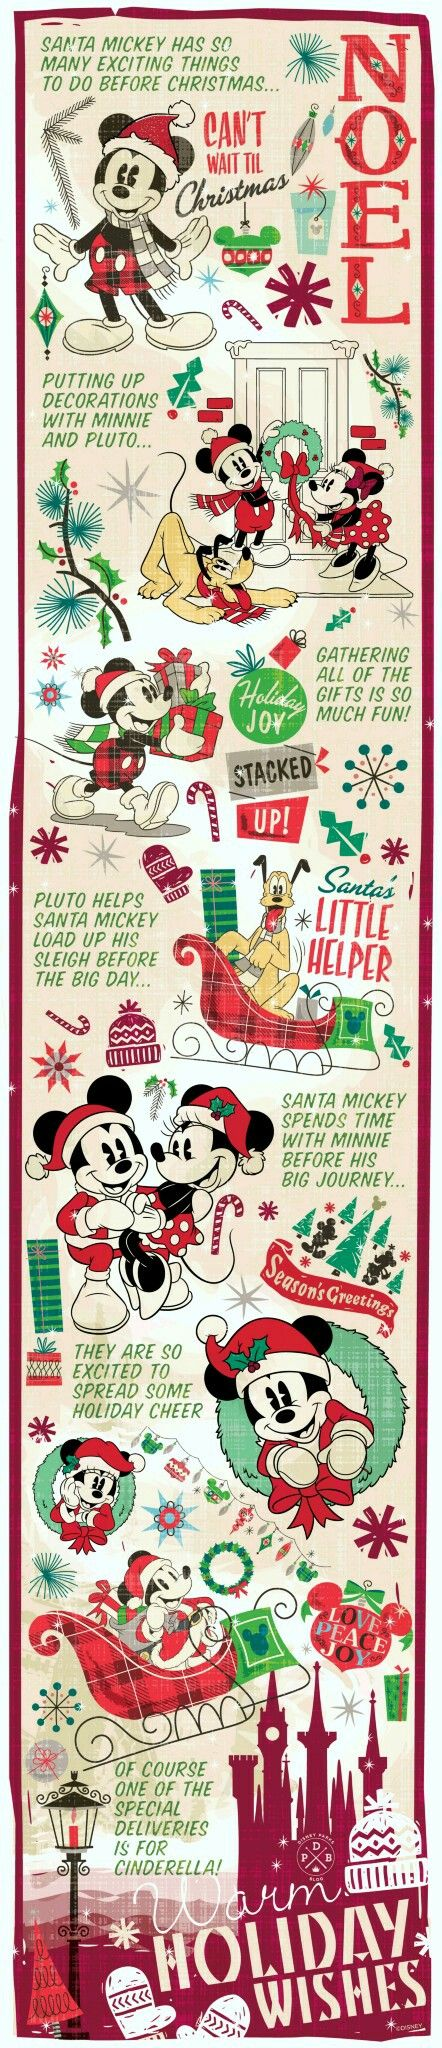 """Disney Classics"":  ""Greeting from Mickey"""